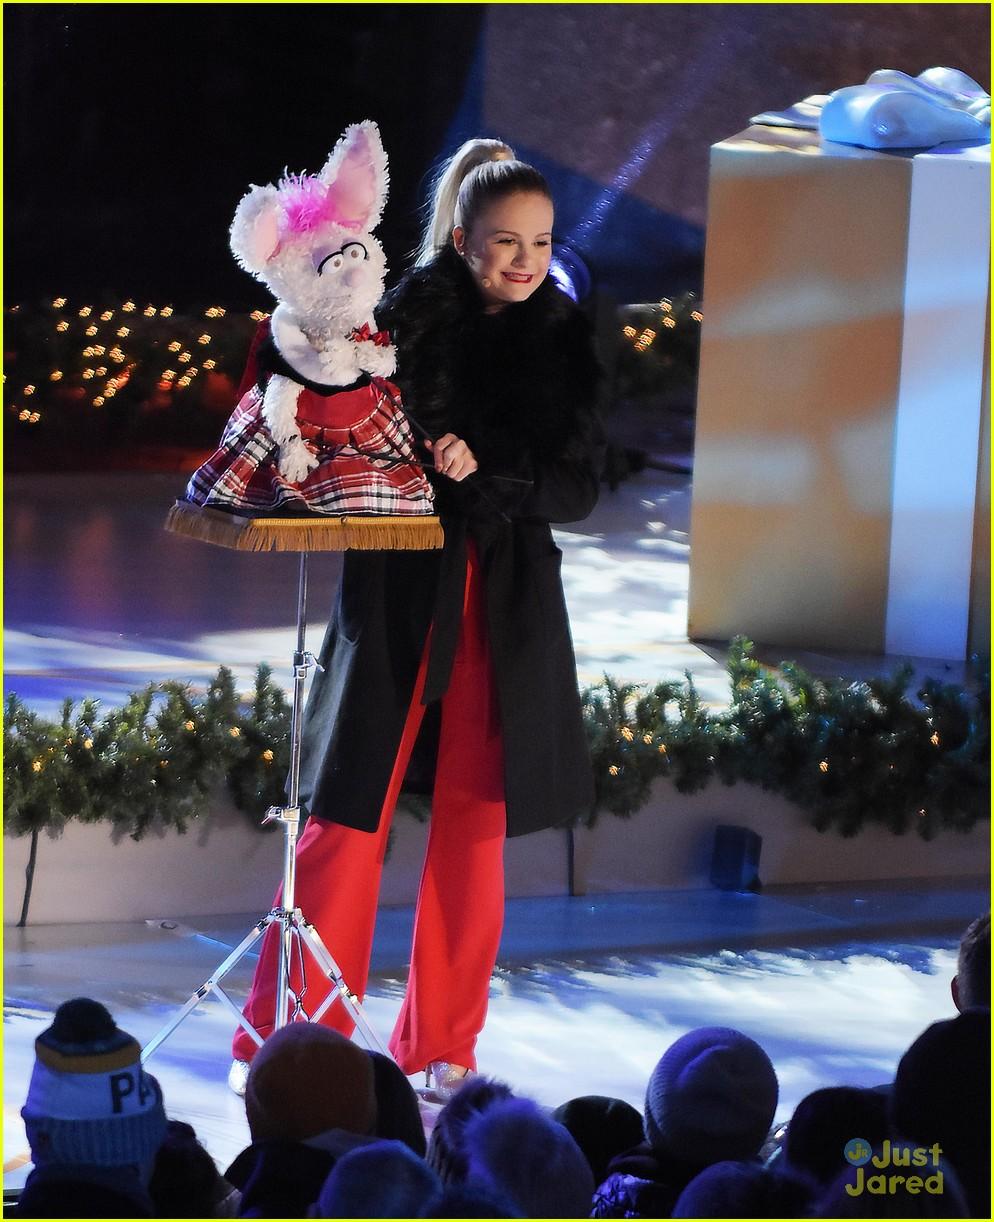 Rockefeller Center Christmas Tree Lighting Performers: Darci Lynne Farmer Rings In The Holidays At Rockefeller